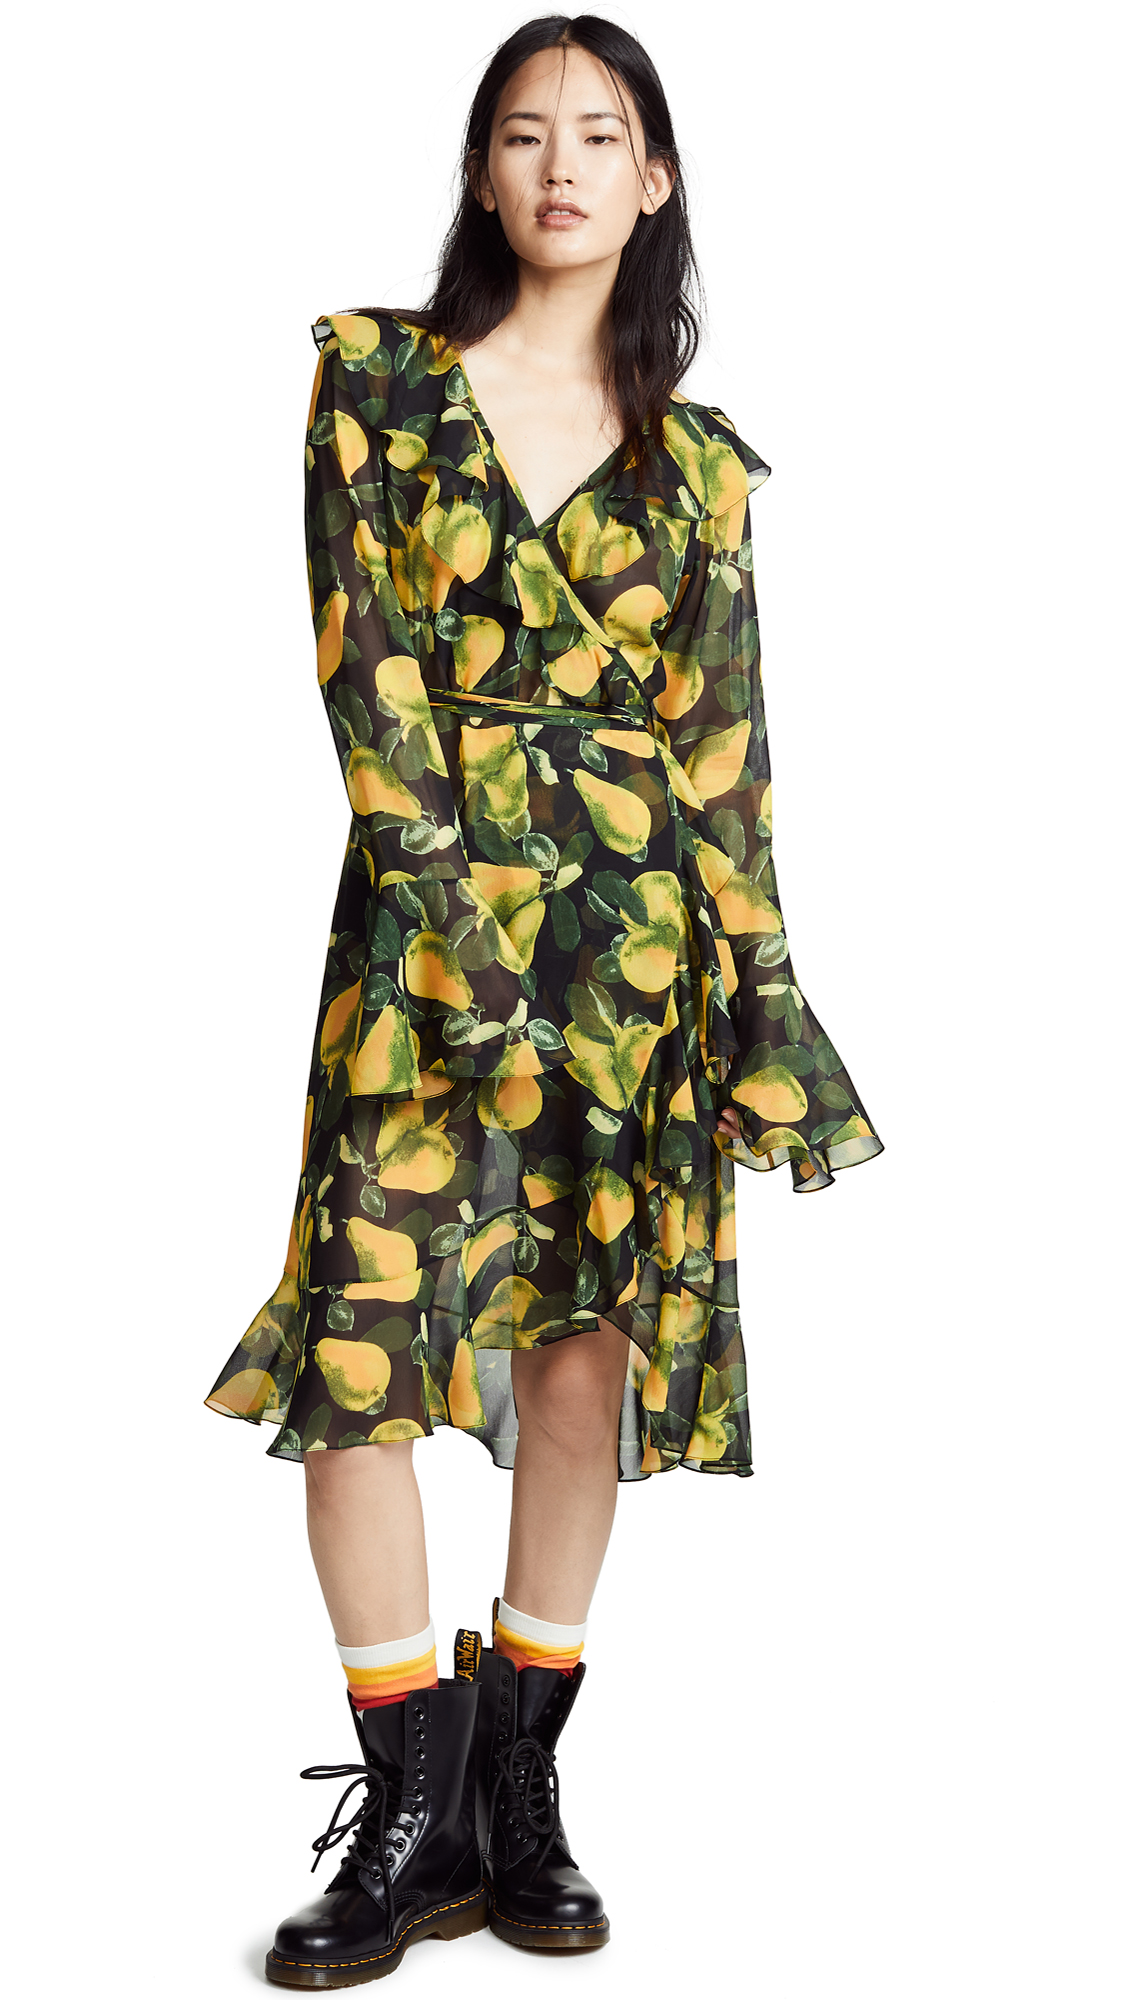 Marc Jacobs Redux Grunge Bell Sleeve Dress - Green Multi